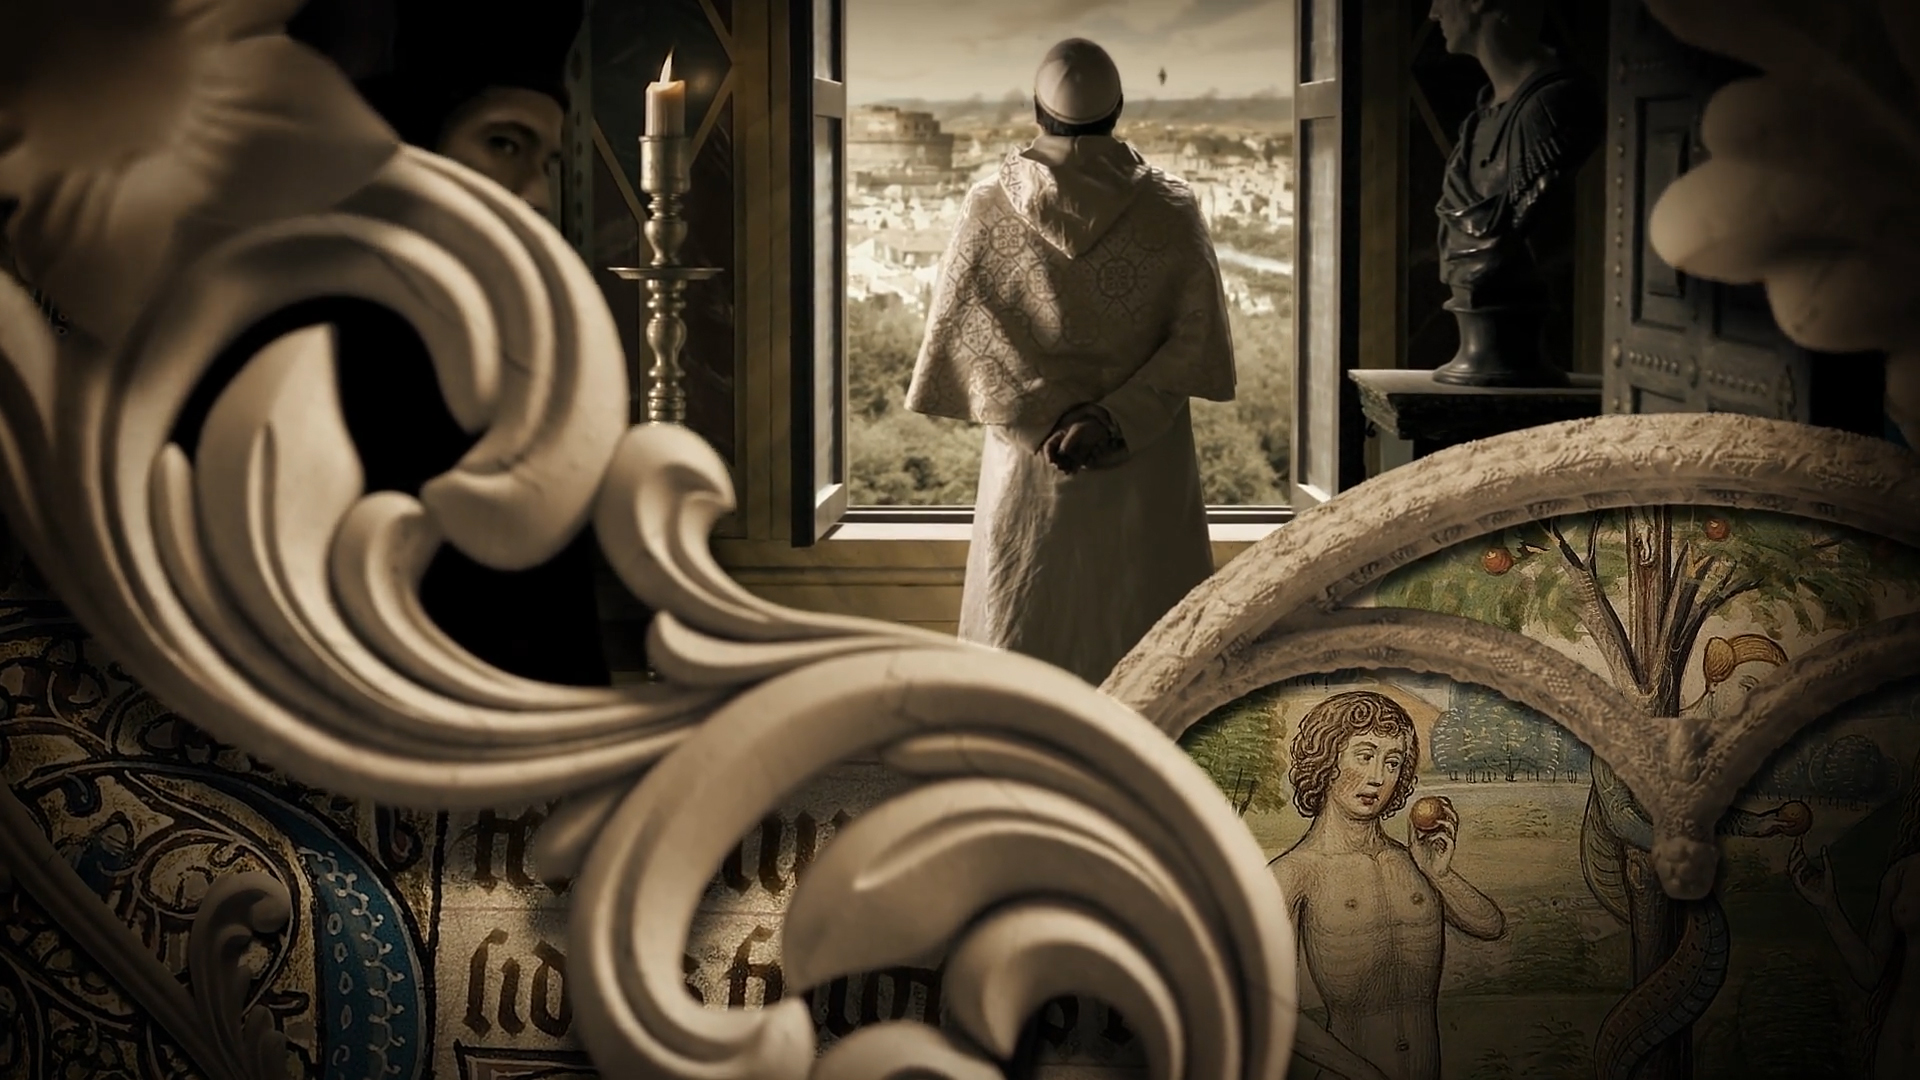 promo-serie-isabel-tve-la-1-temporada-3-religion-1920x1080